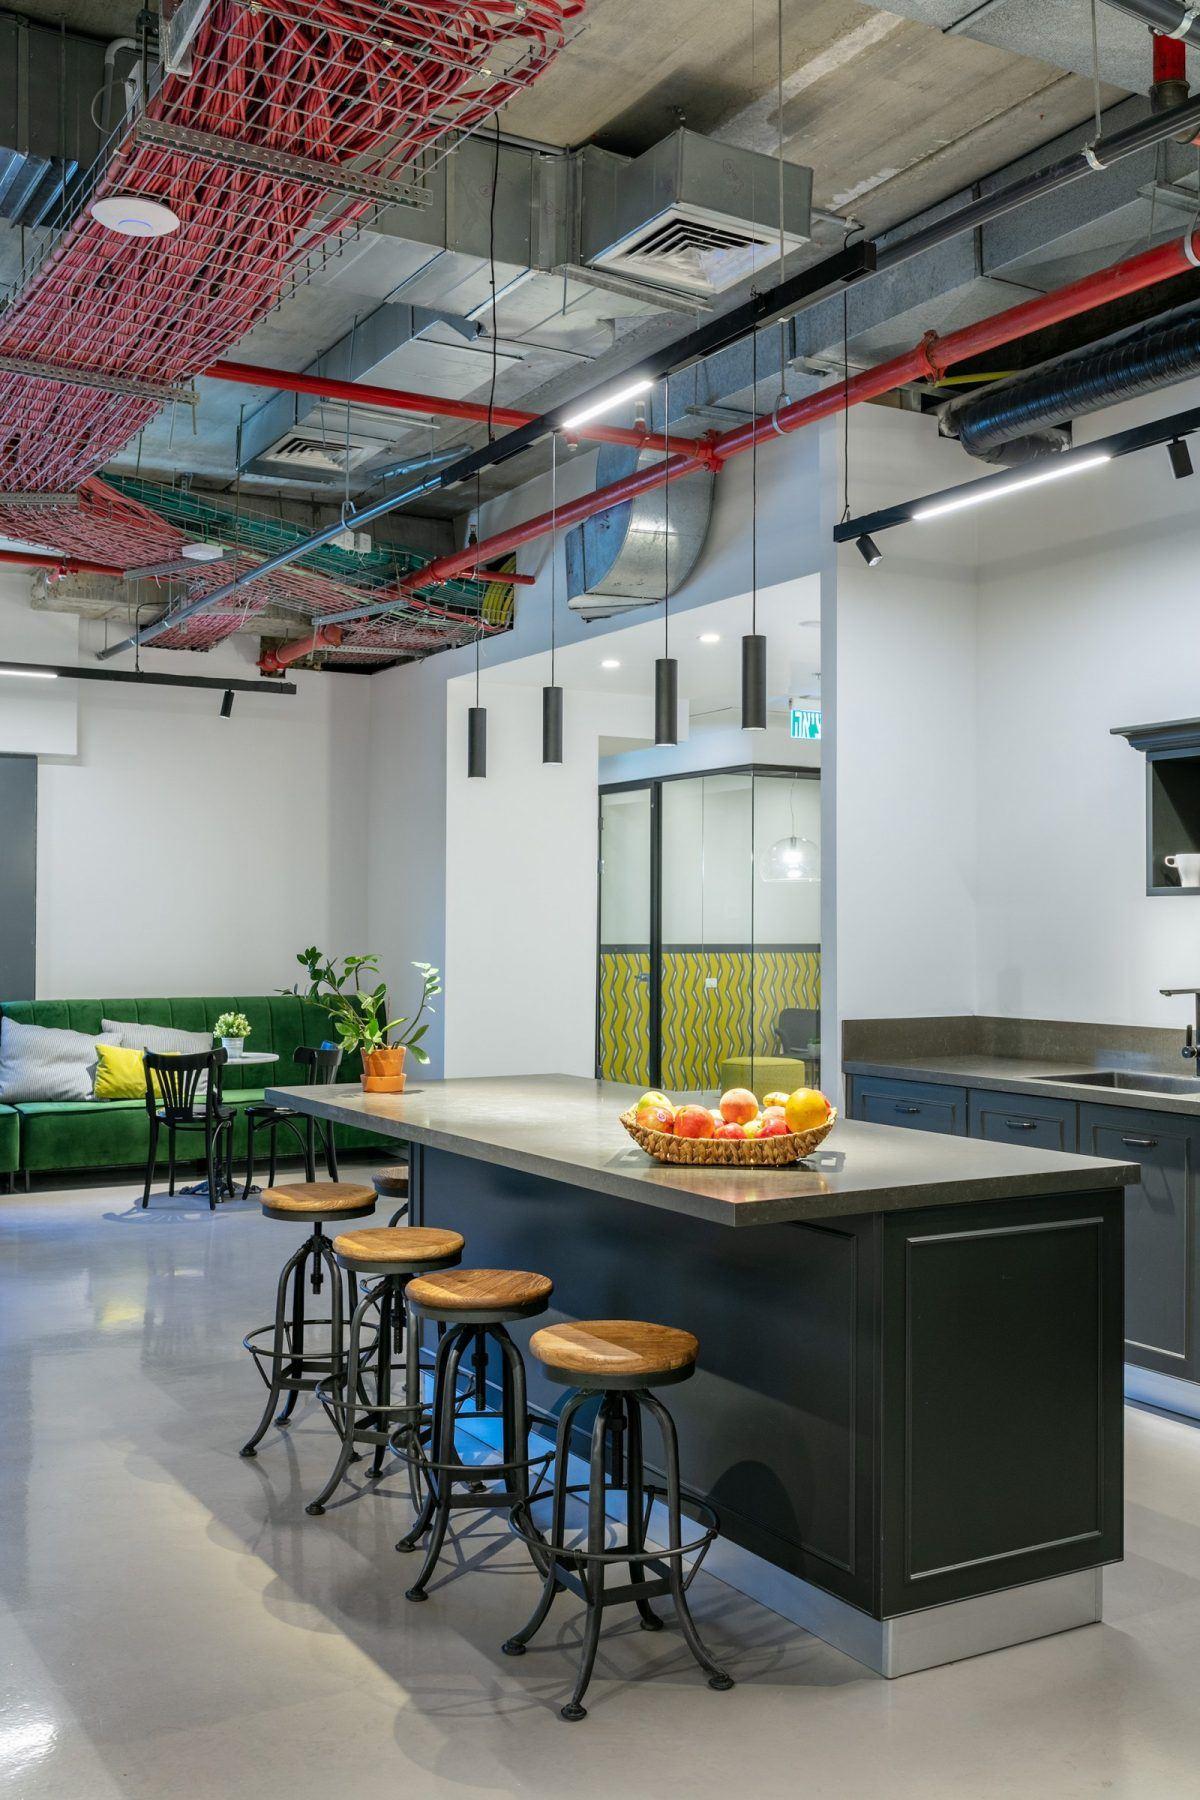 Twistlock Office Space תאורה מעל שולחן האוכל במטבח בביצועו של קמחי דורי